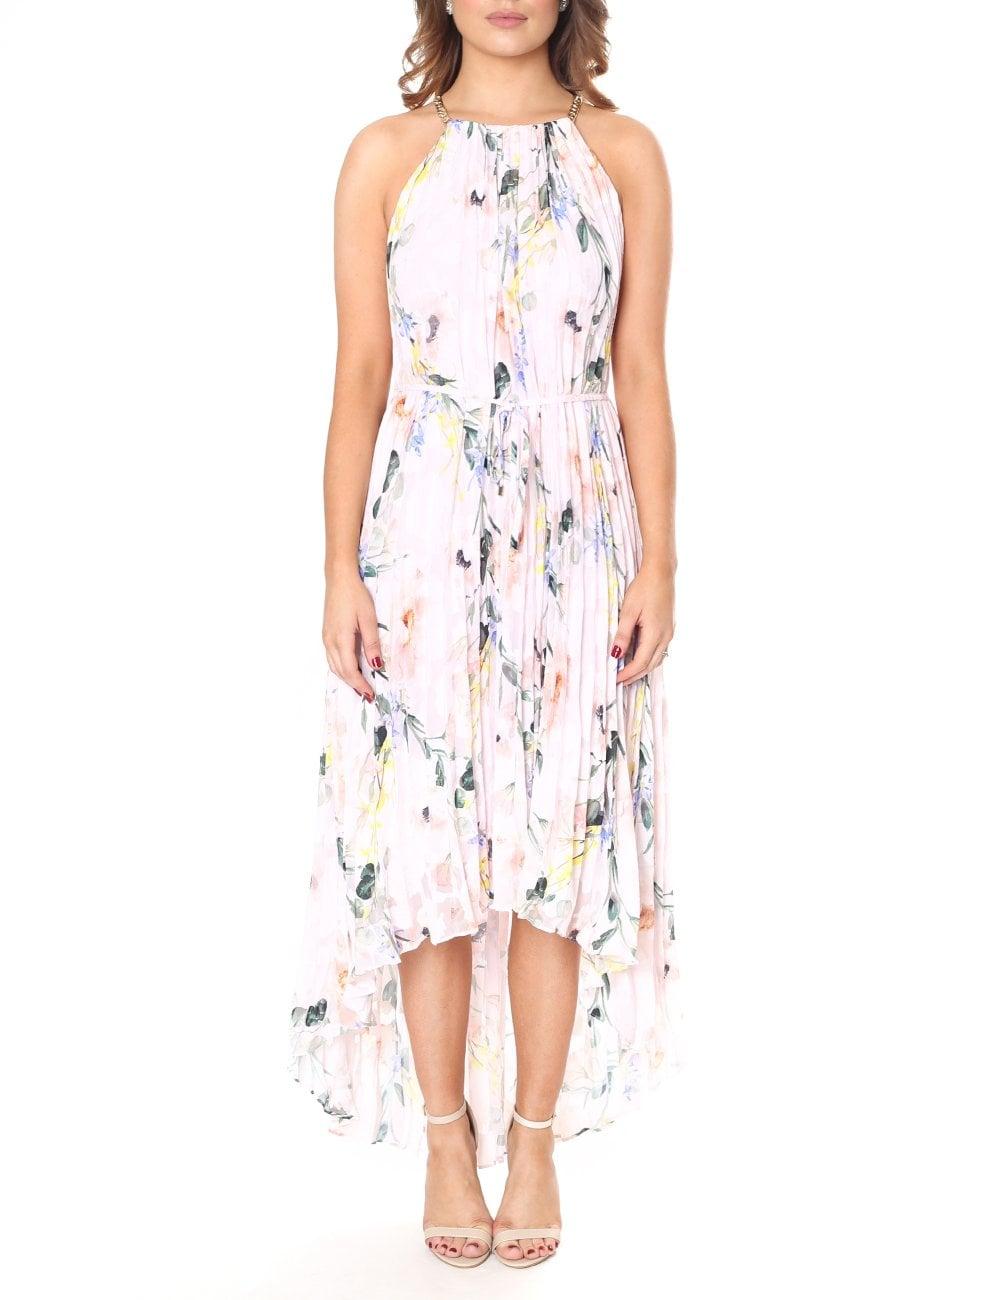 4b38e98a67532 Ted Baker Women s Valetia Elegance Pleat Dip Hem Dress